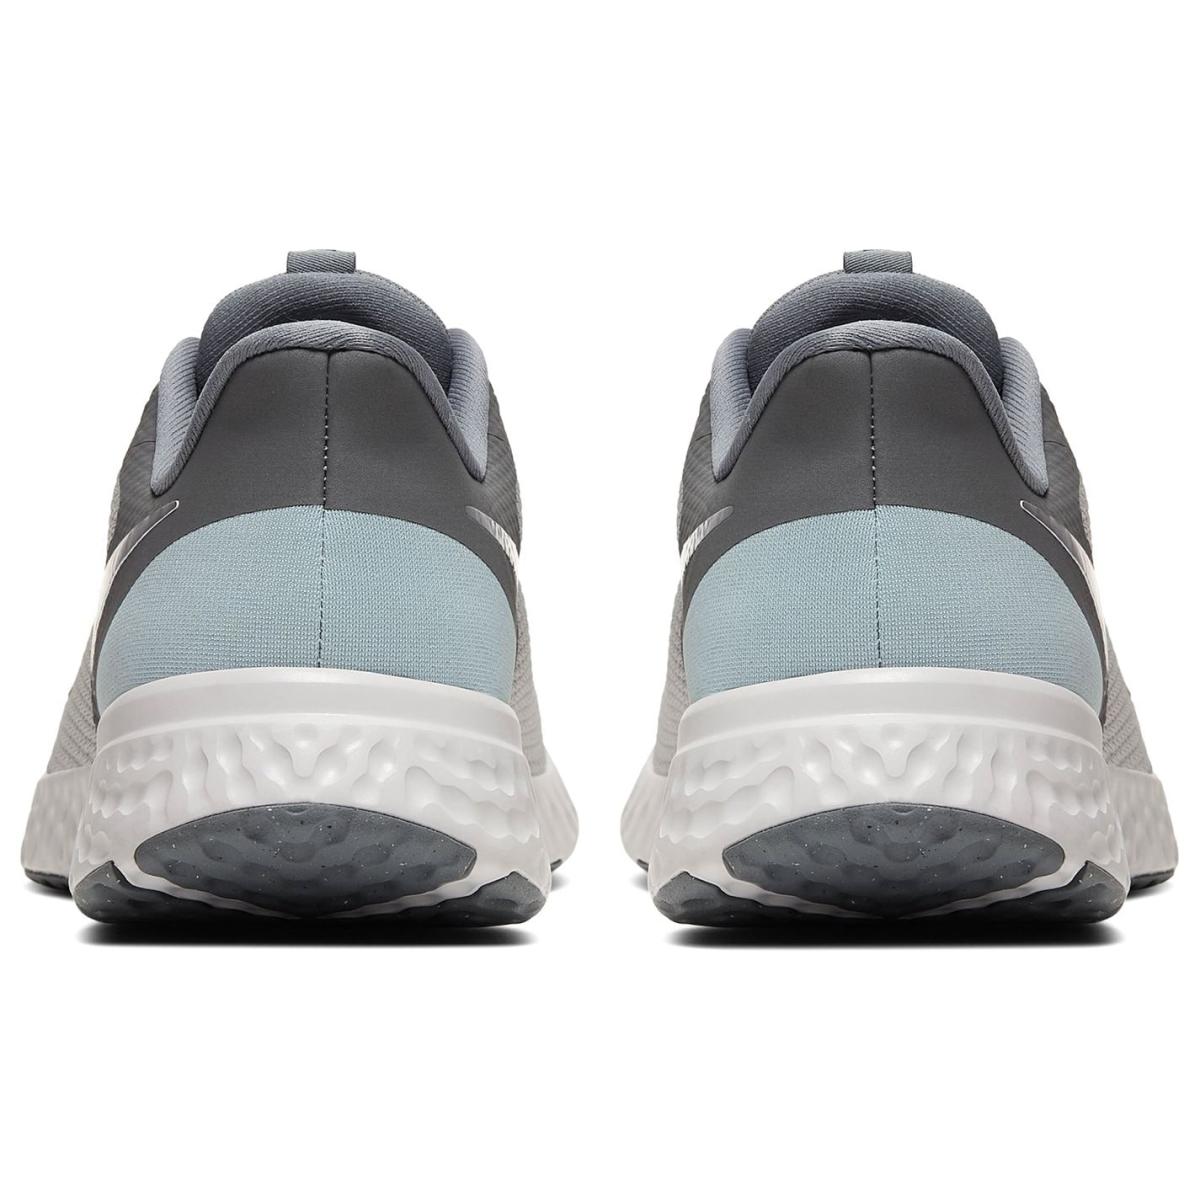 Nike-Revolution-Turnschuhe-Damen-Sneaker-Sportschuhe-Laufschuhe-1160 Indexbild 21